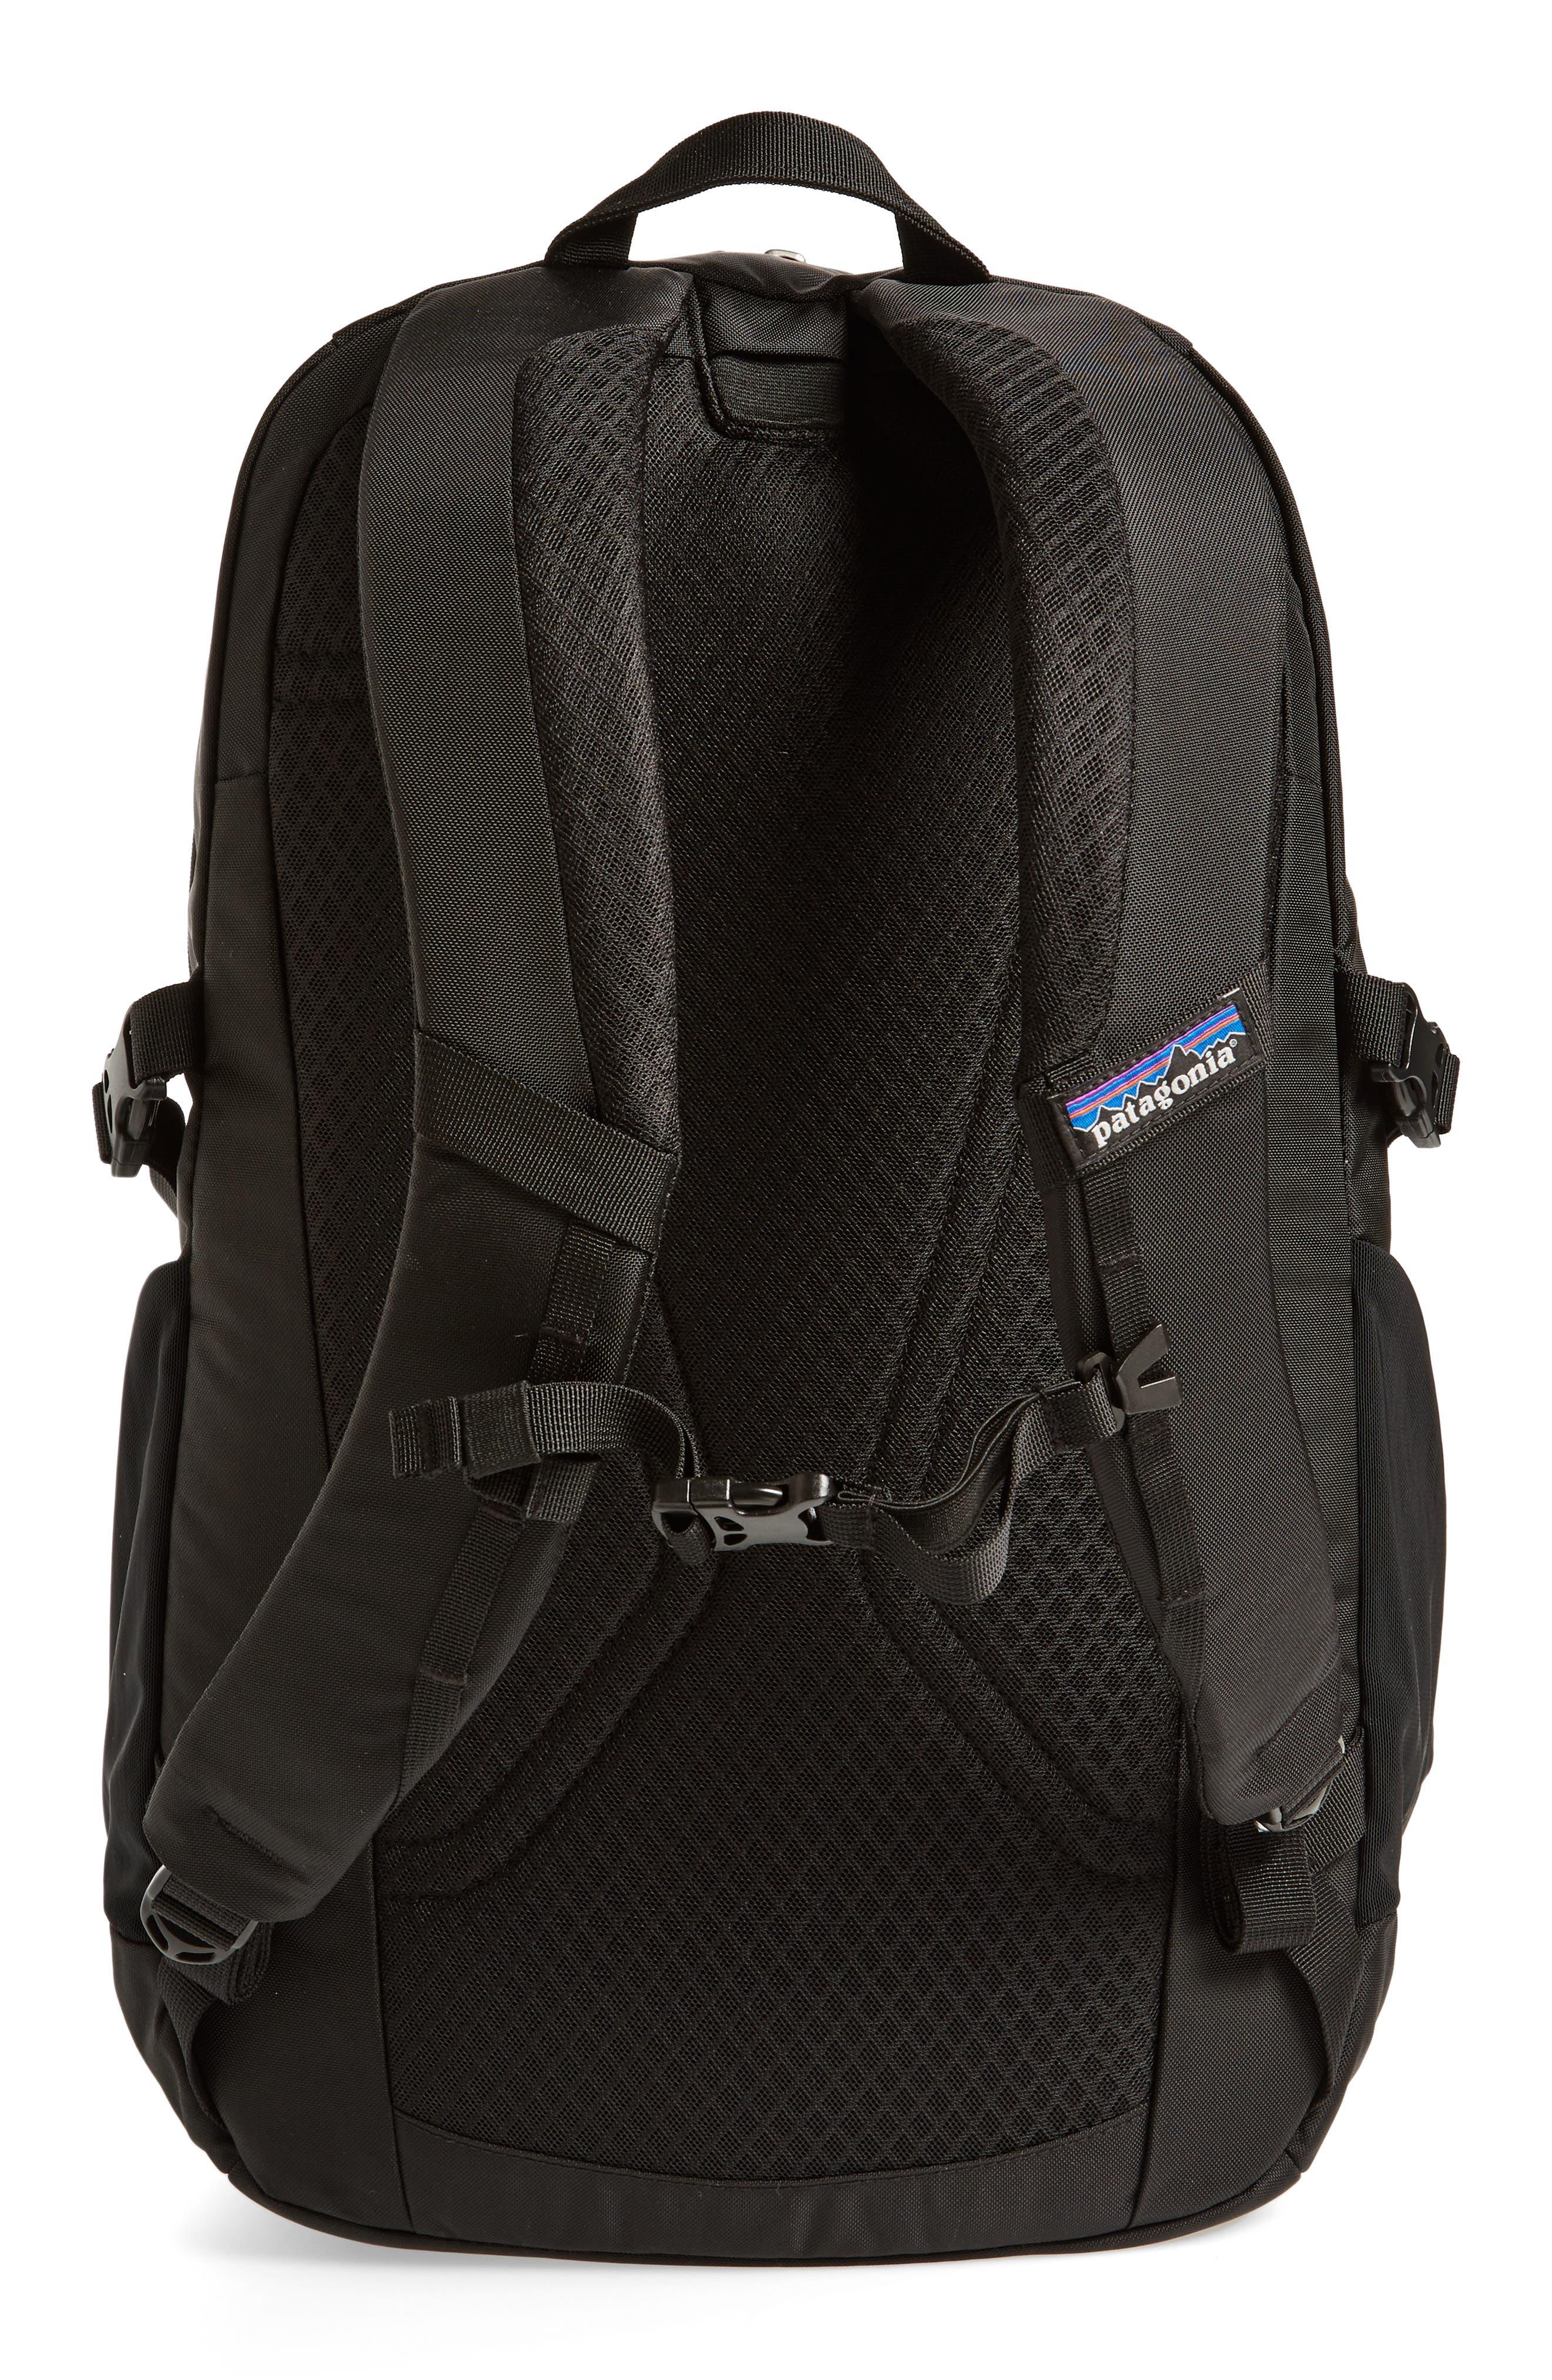 28L Refugio Backpack,                             Alternate thumbnail 3, color,                             BLACK